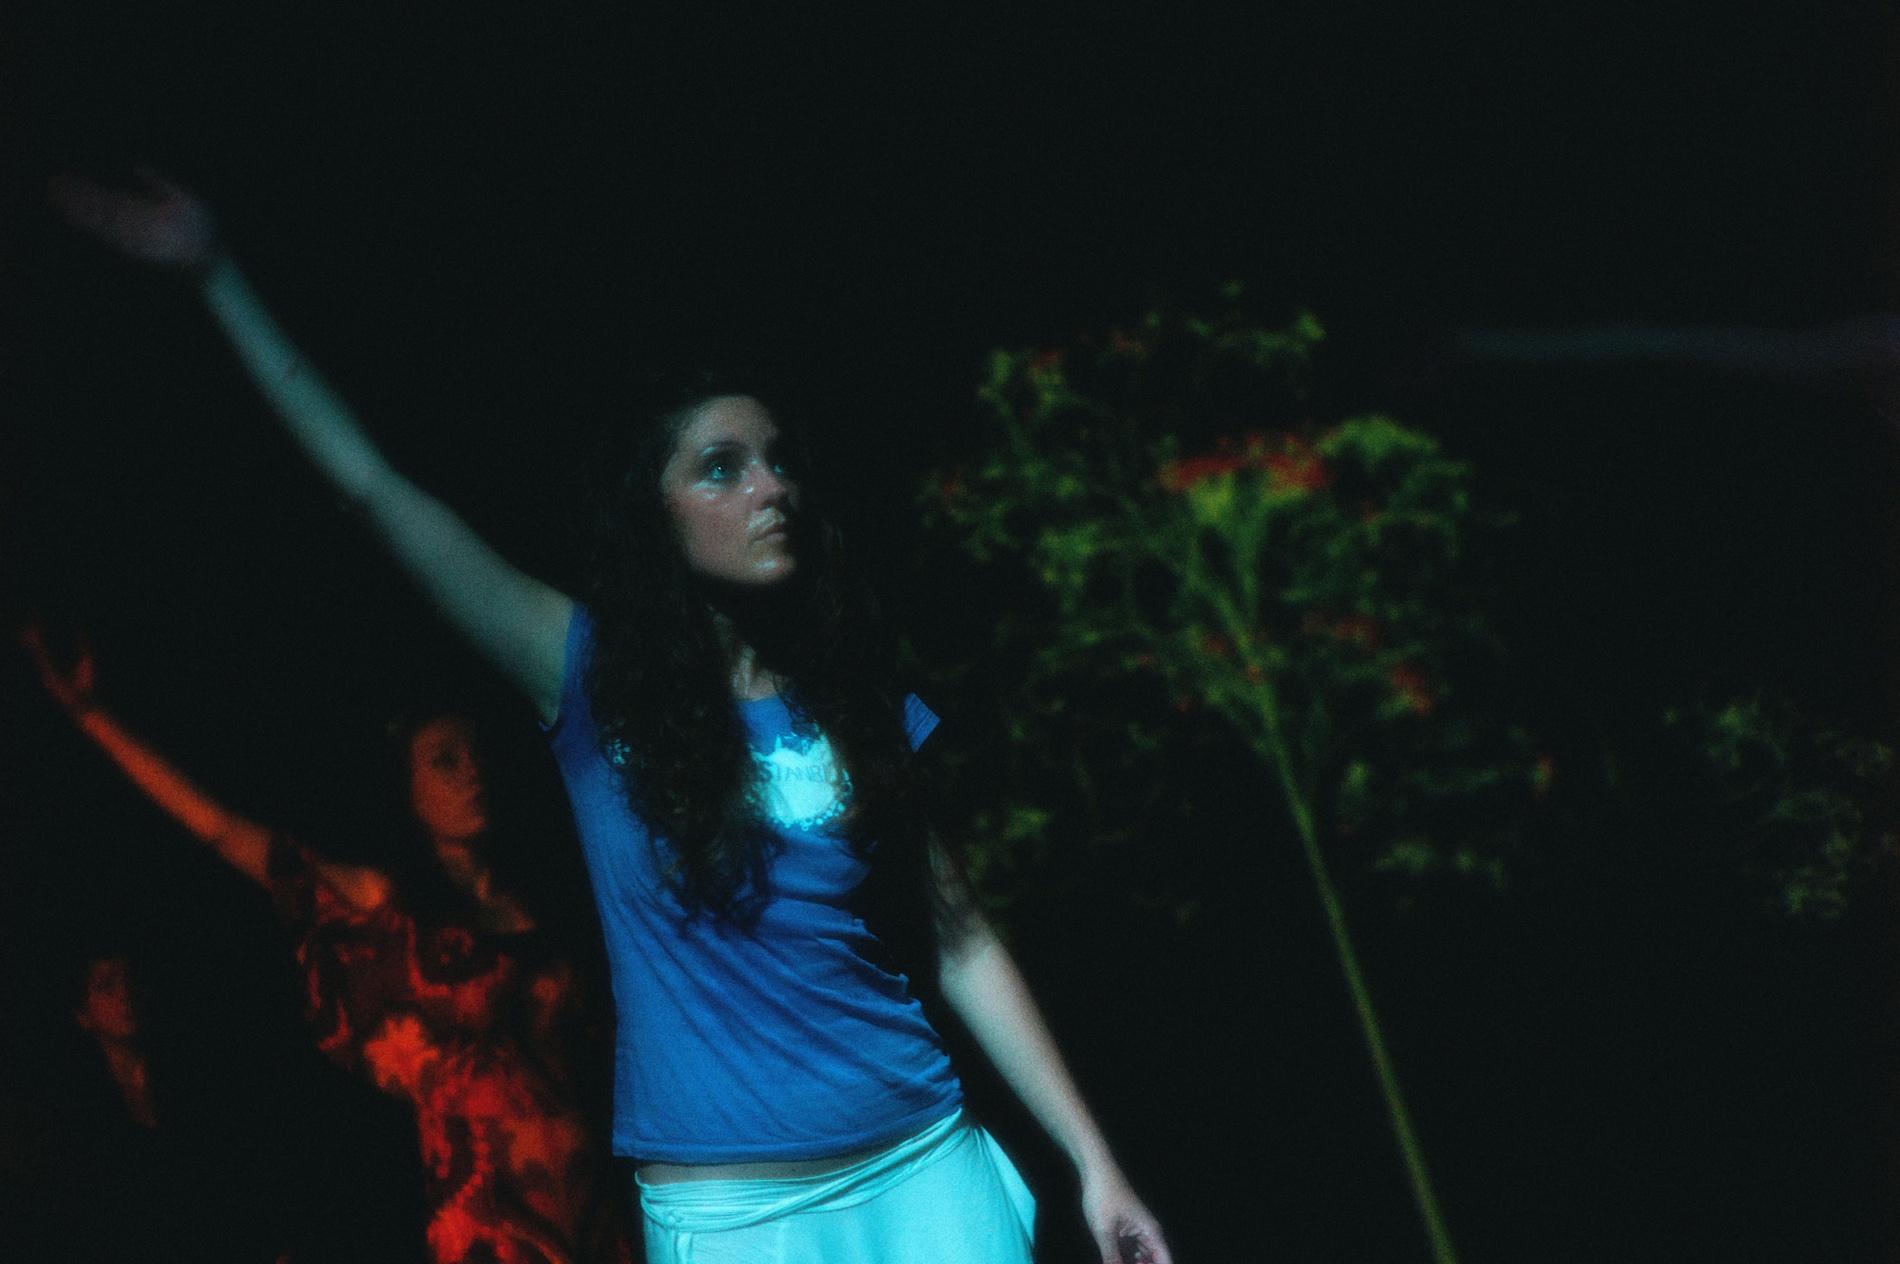 2011-06-02 at 19-46-29, dance.jpg